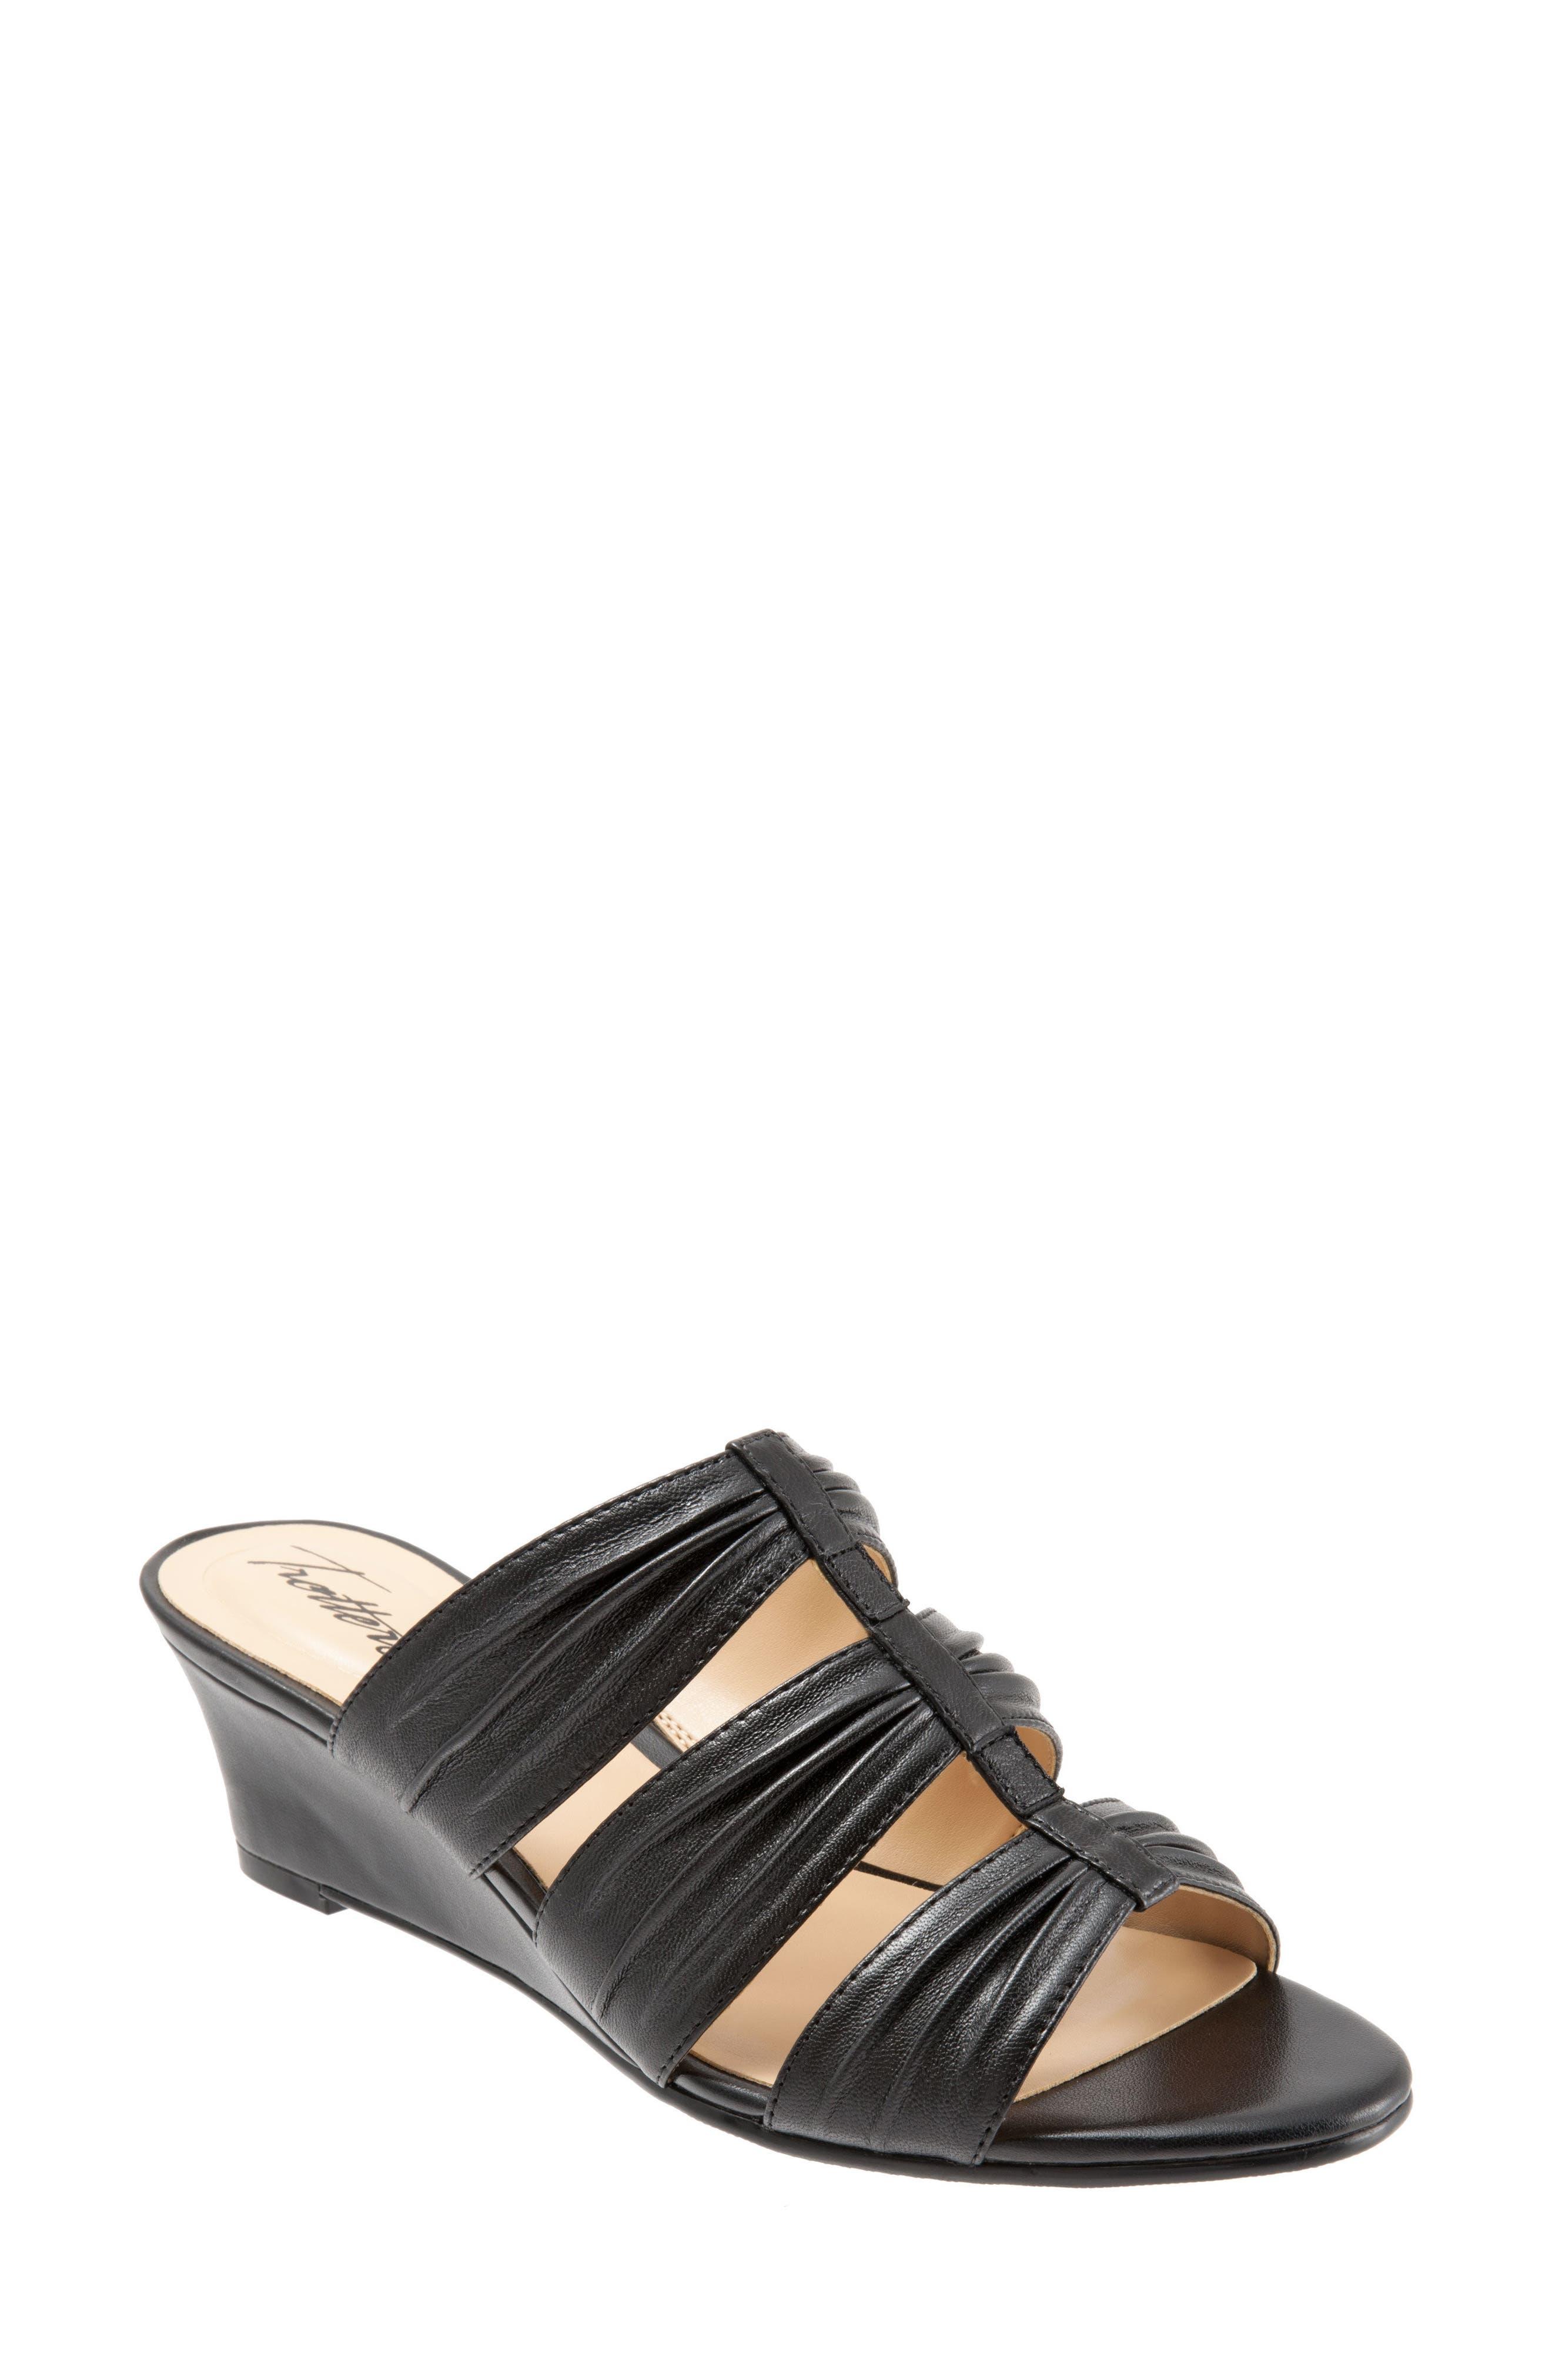 Mia Wedge Sandal,                         Main,                         color, BLACK LEATHER